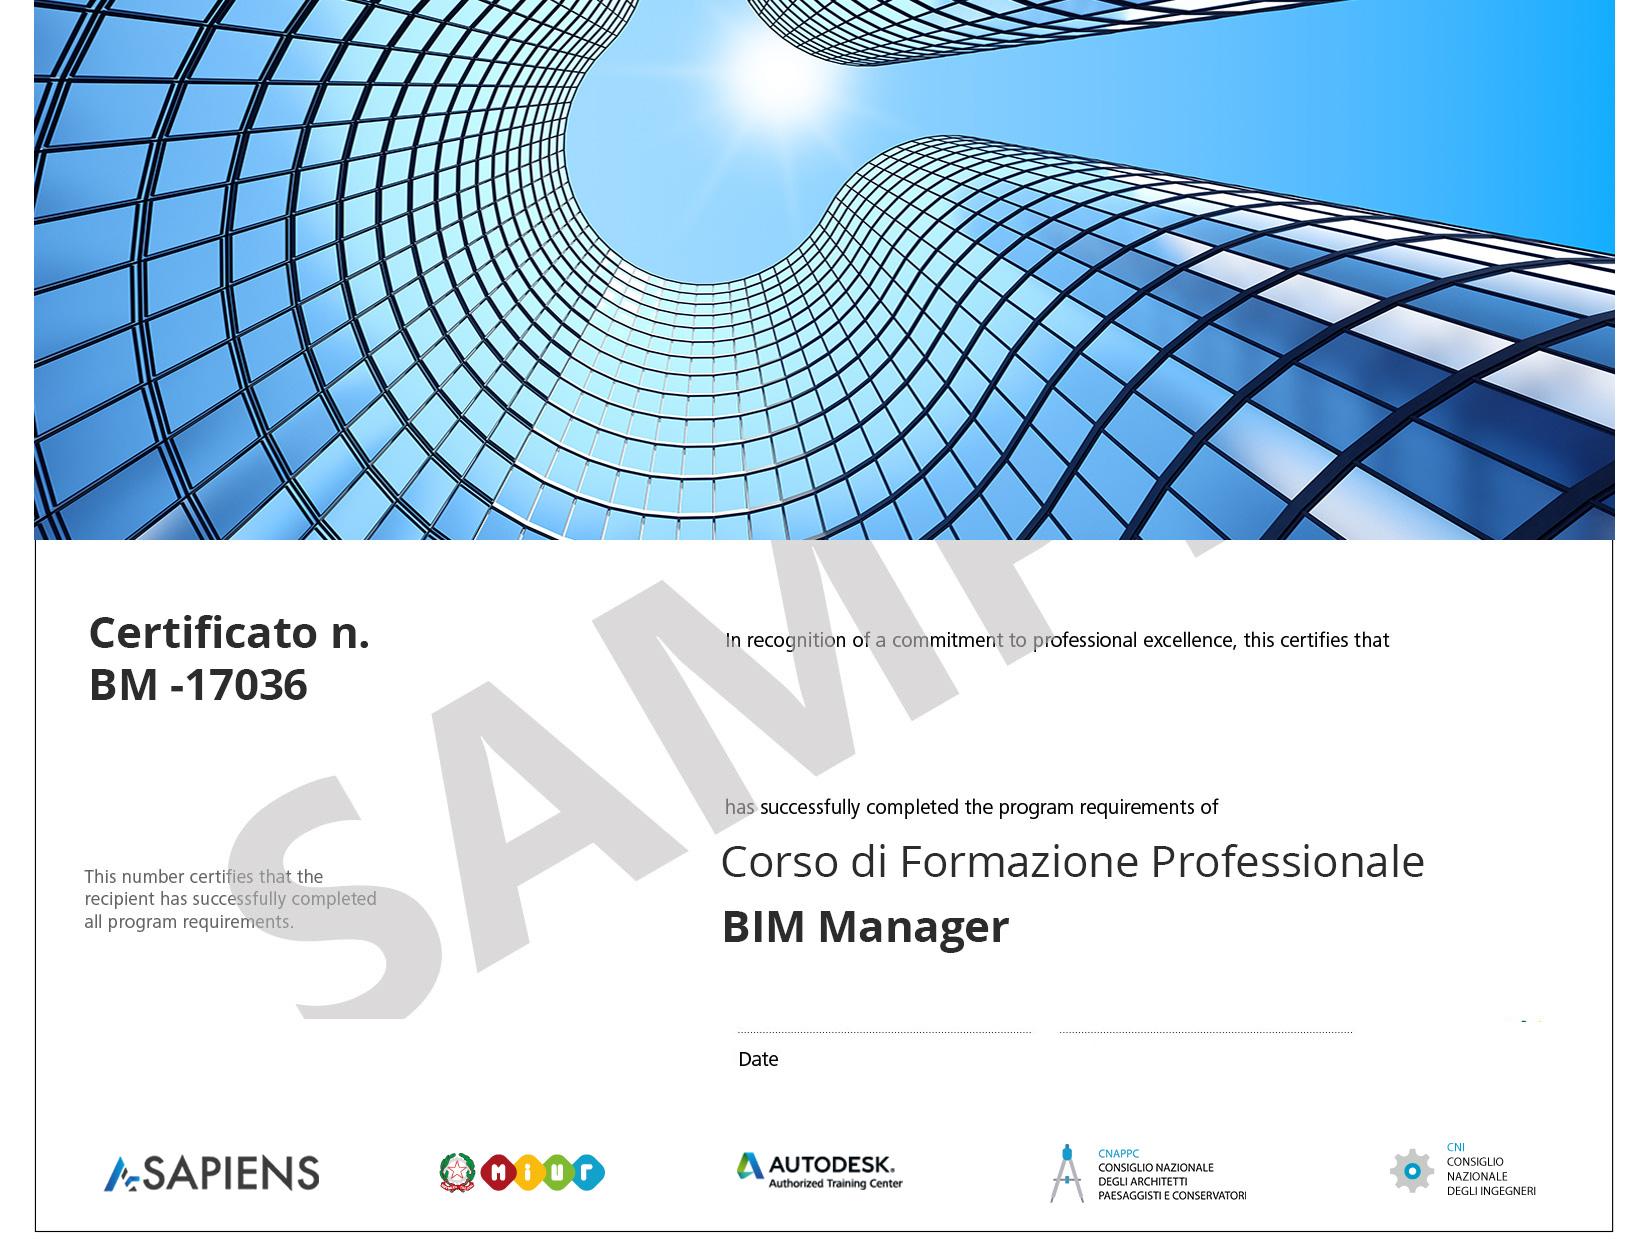 certificato-bim-manager-asapiens